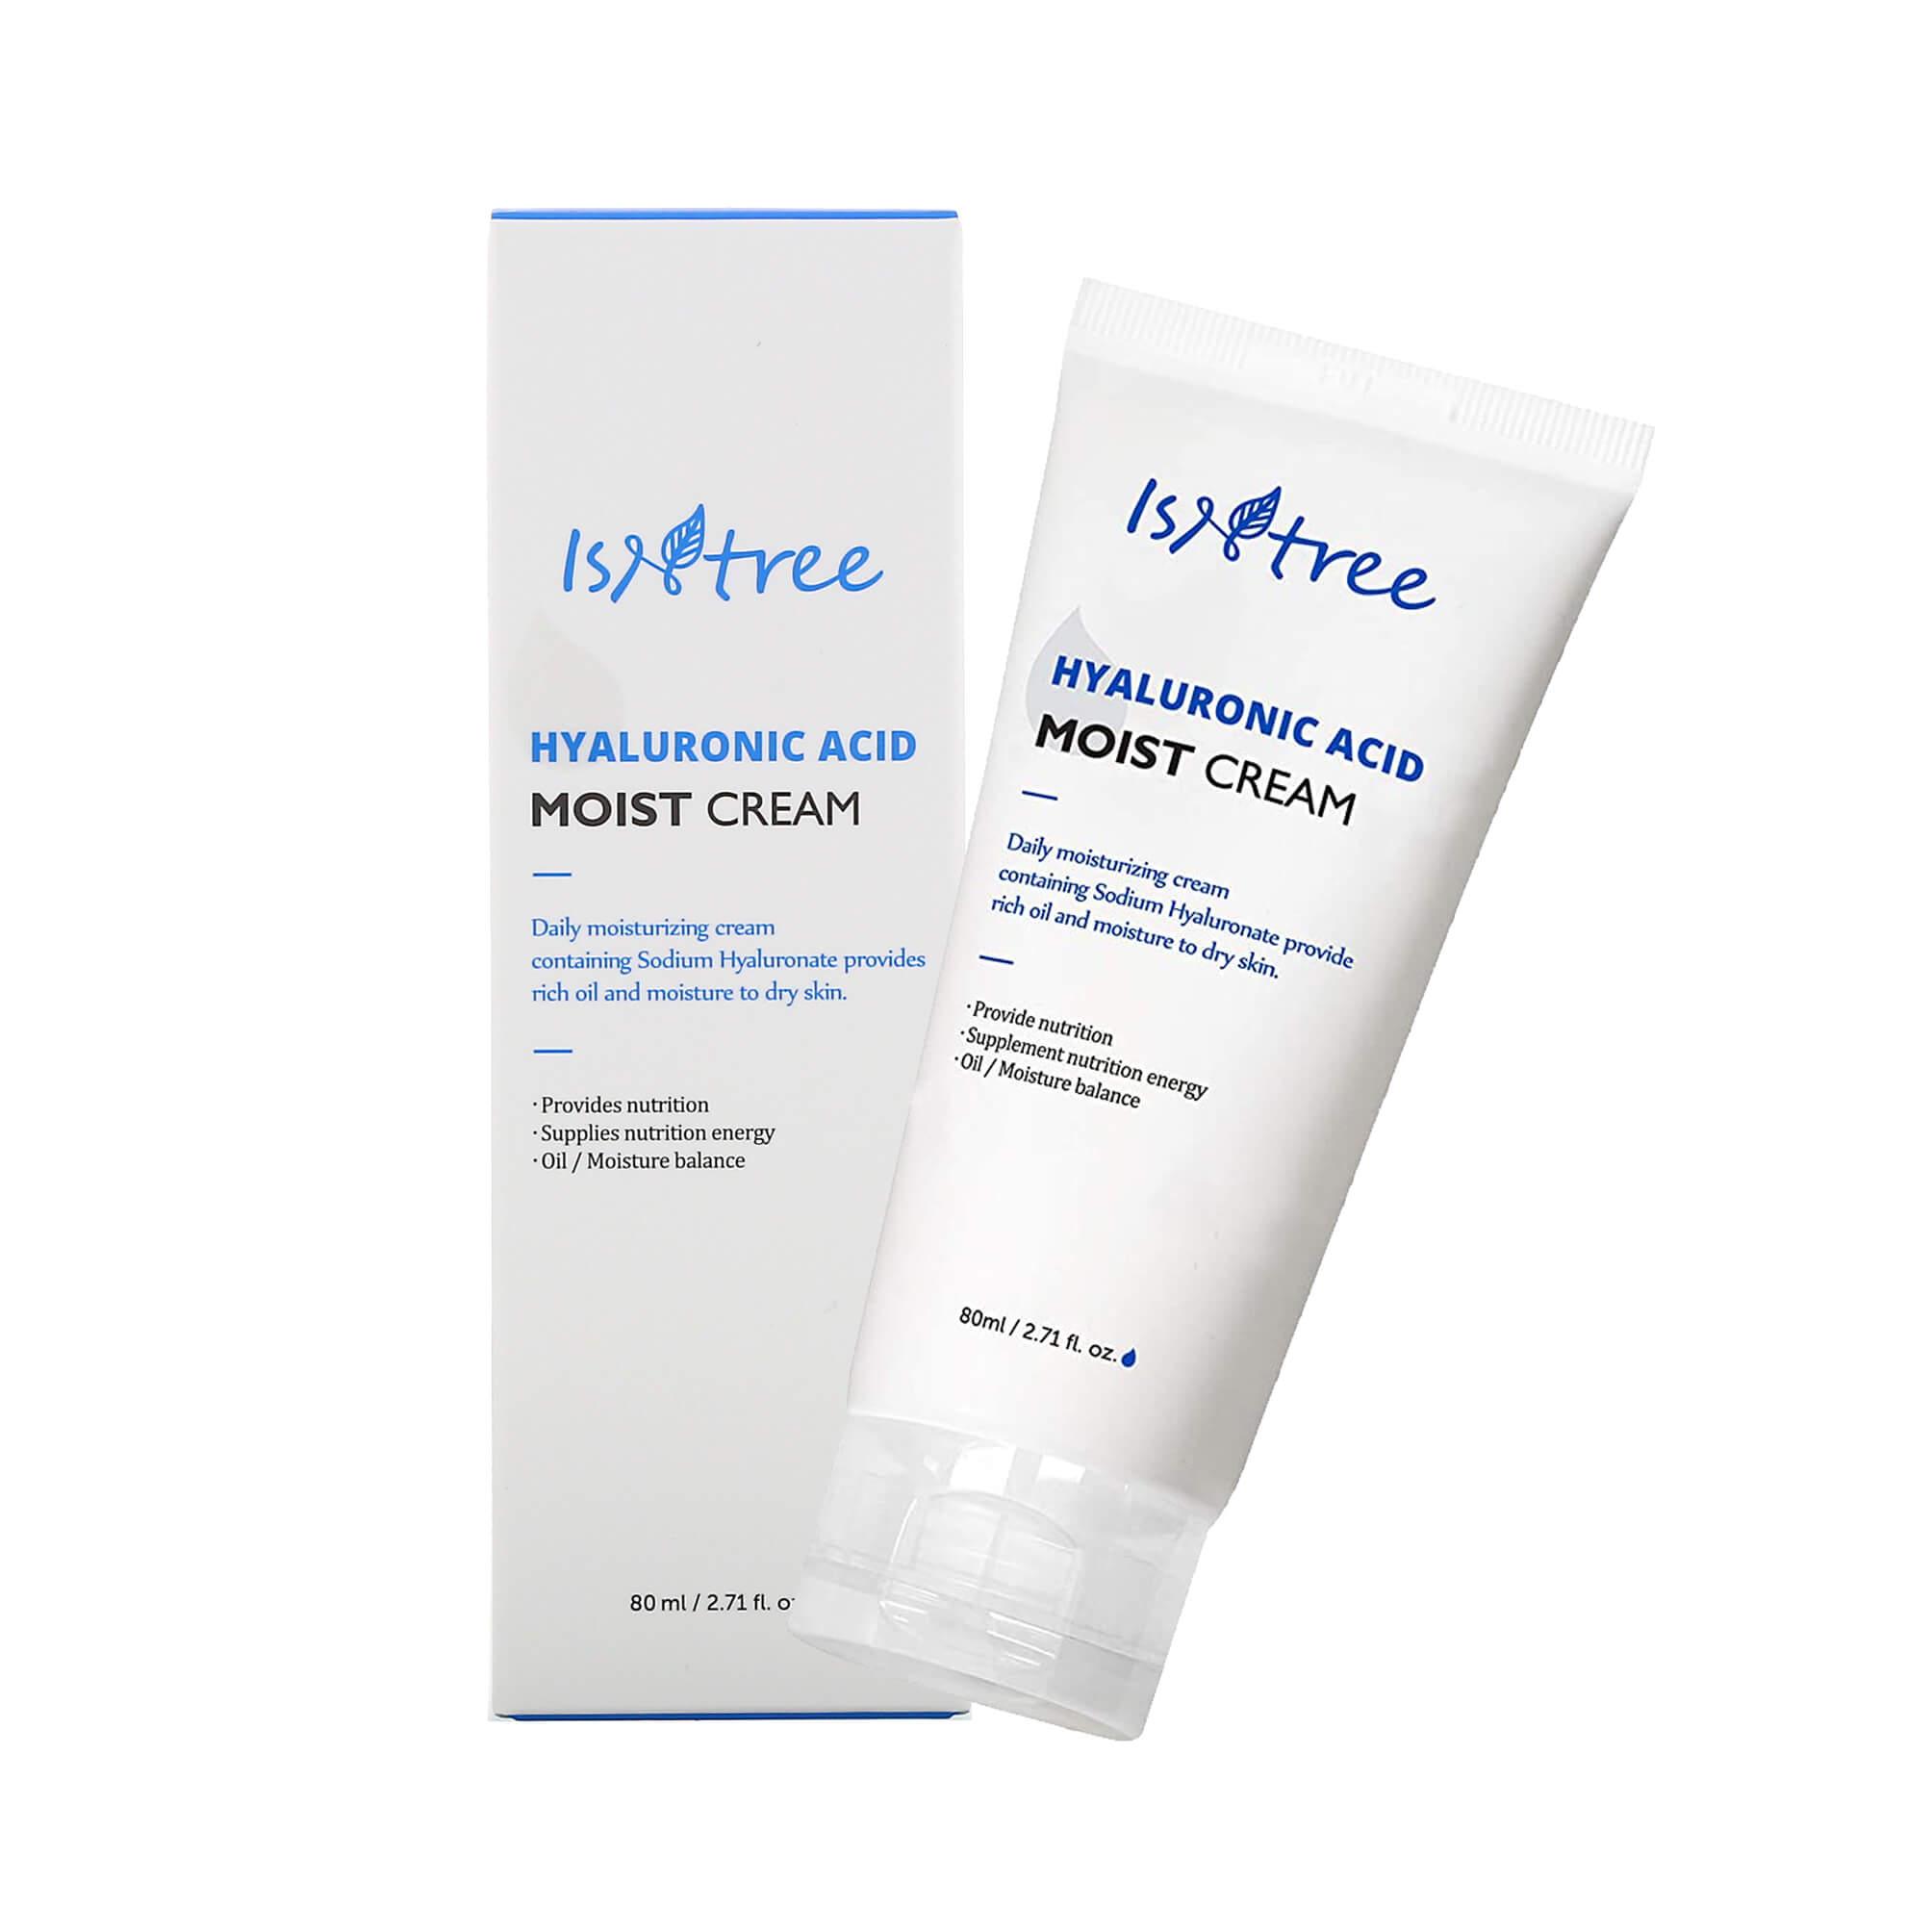 Крем для глубокого увлажнения кожи IsNtree Hyaluronic Acid Moist Cream - 80 мл